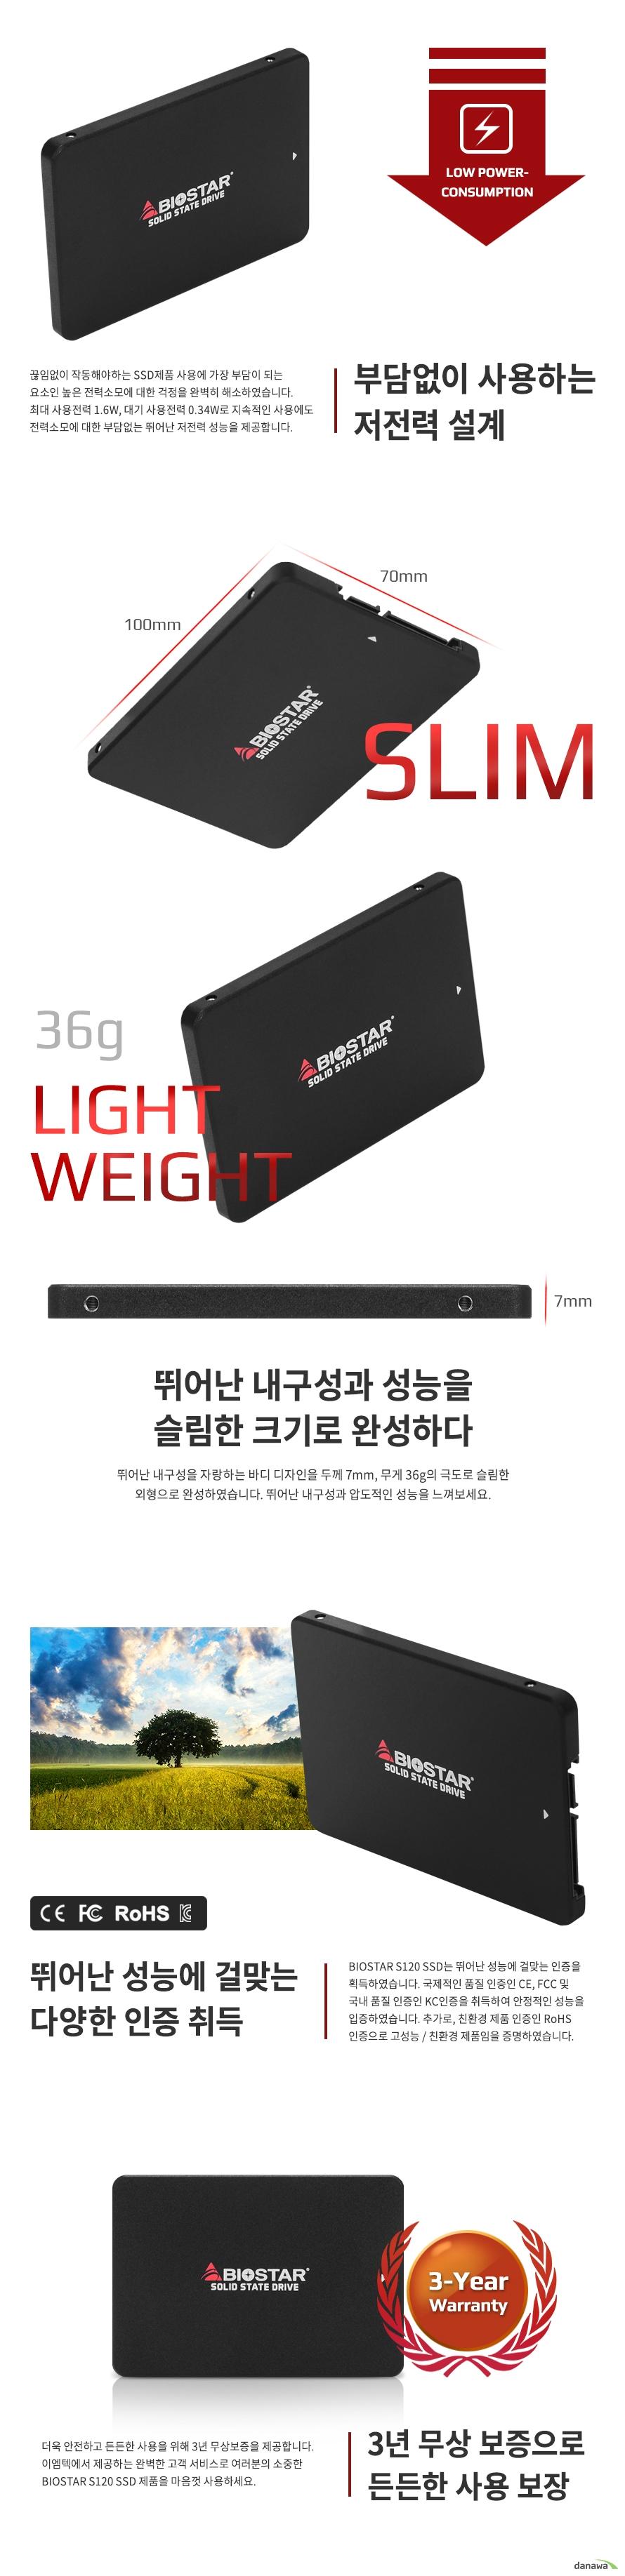 BIOSTAR  S120(512GB)